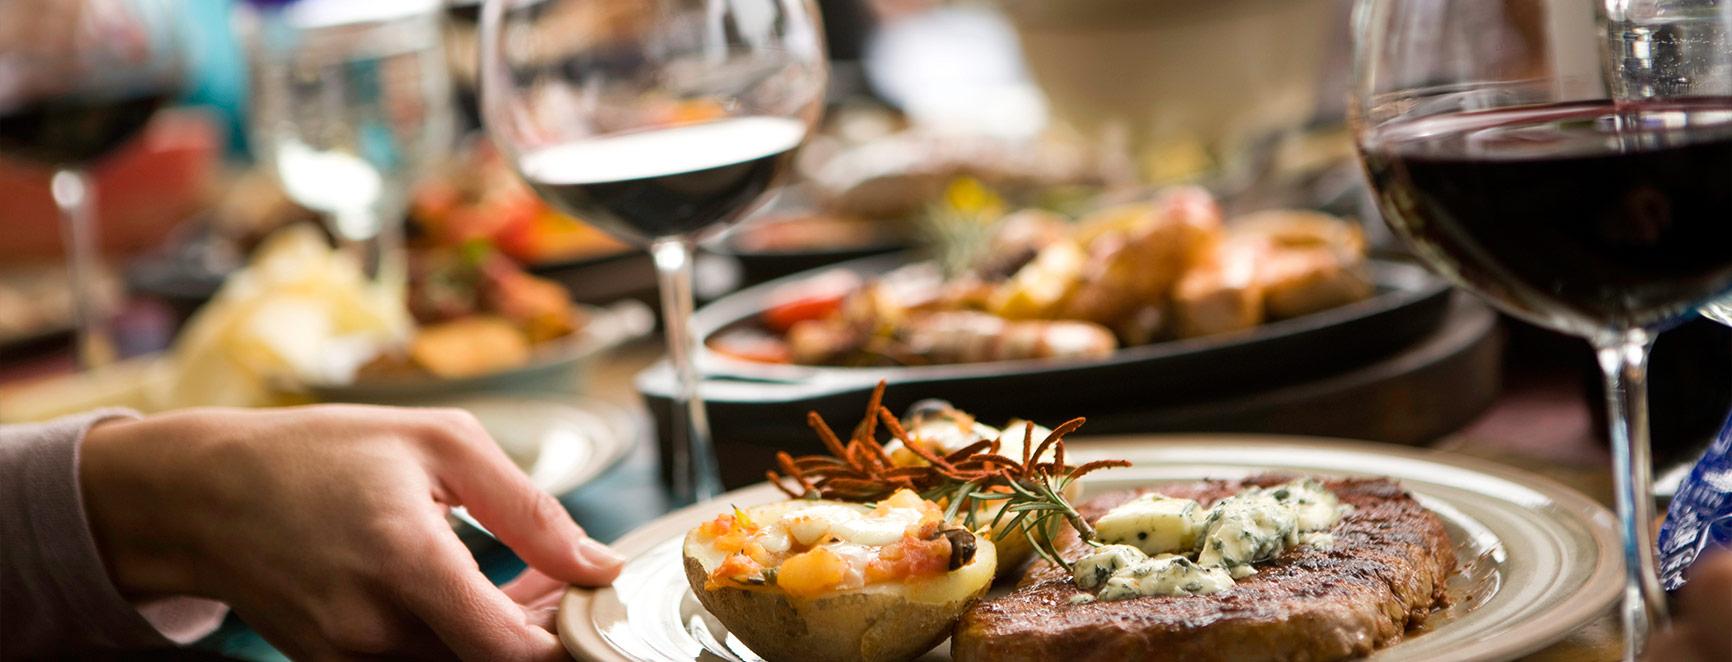 Food Service Minimum Wage Colorado